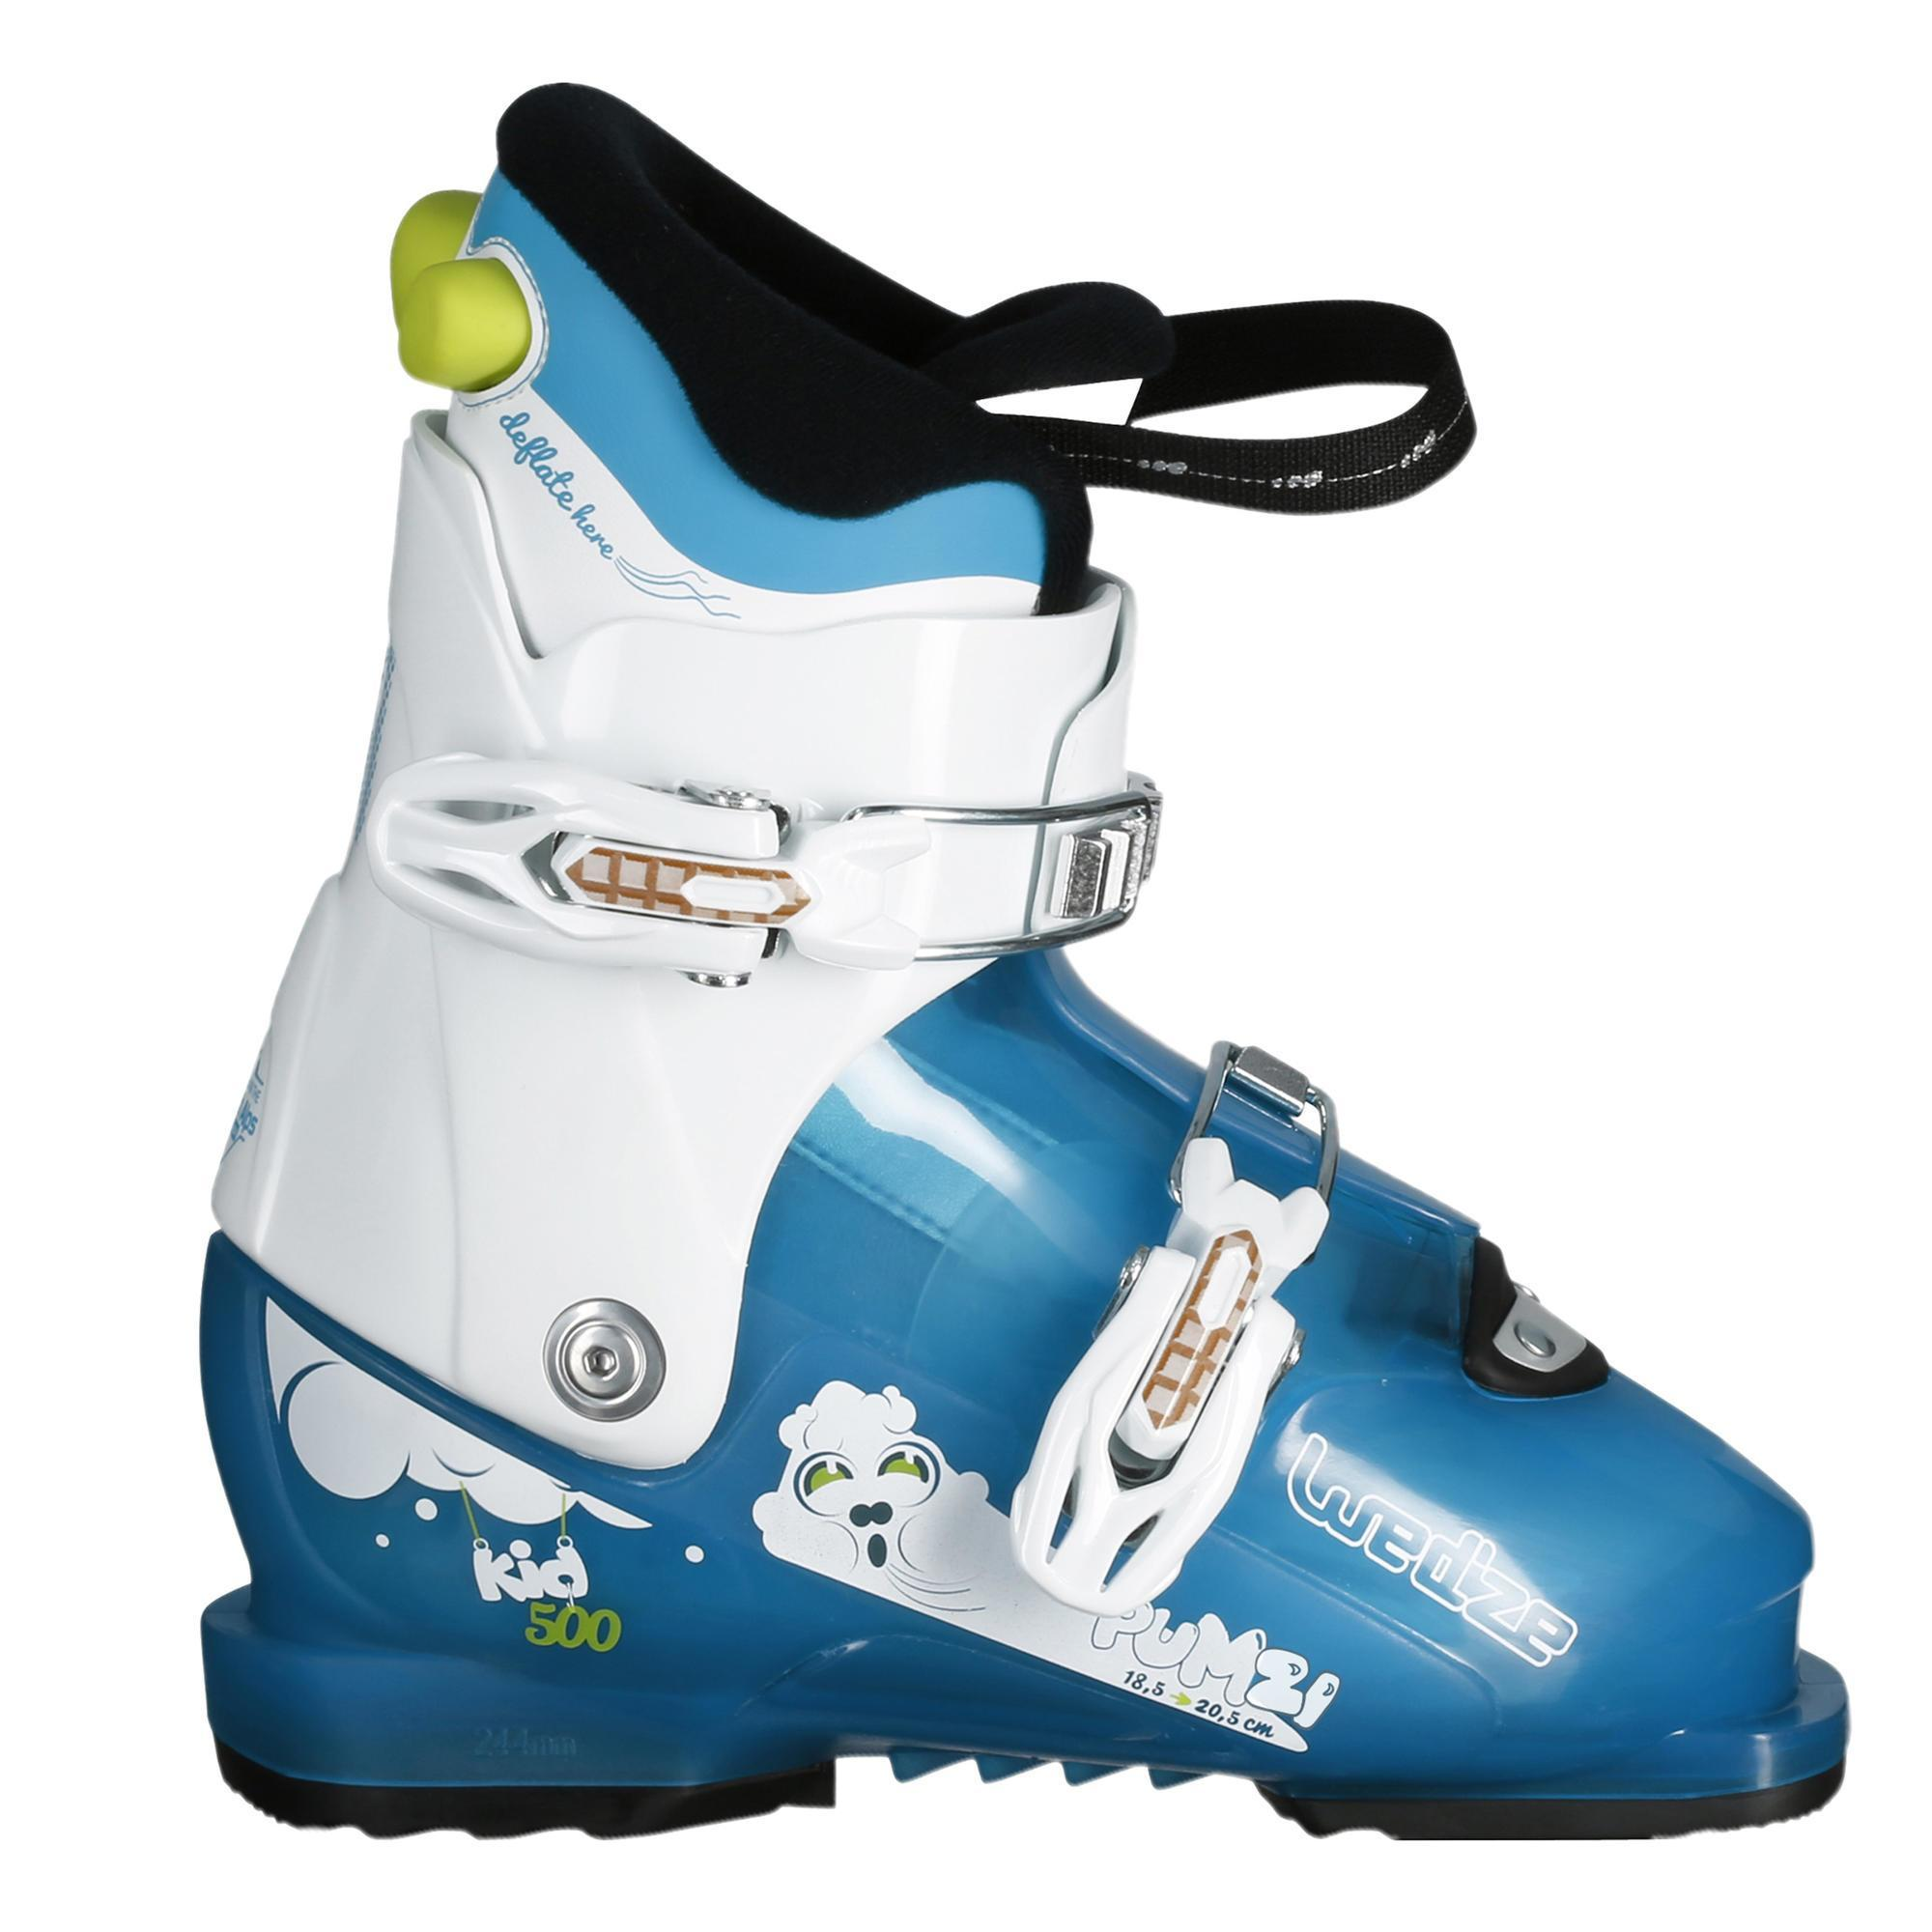 e7eafaba21f Skischoenen kopen ← Decathlon.nl